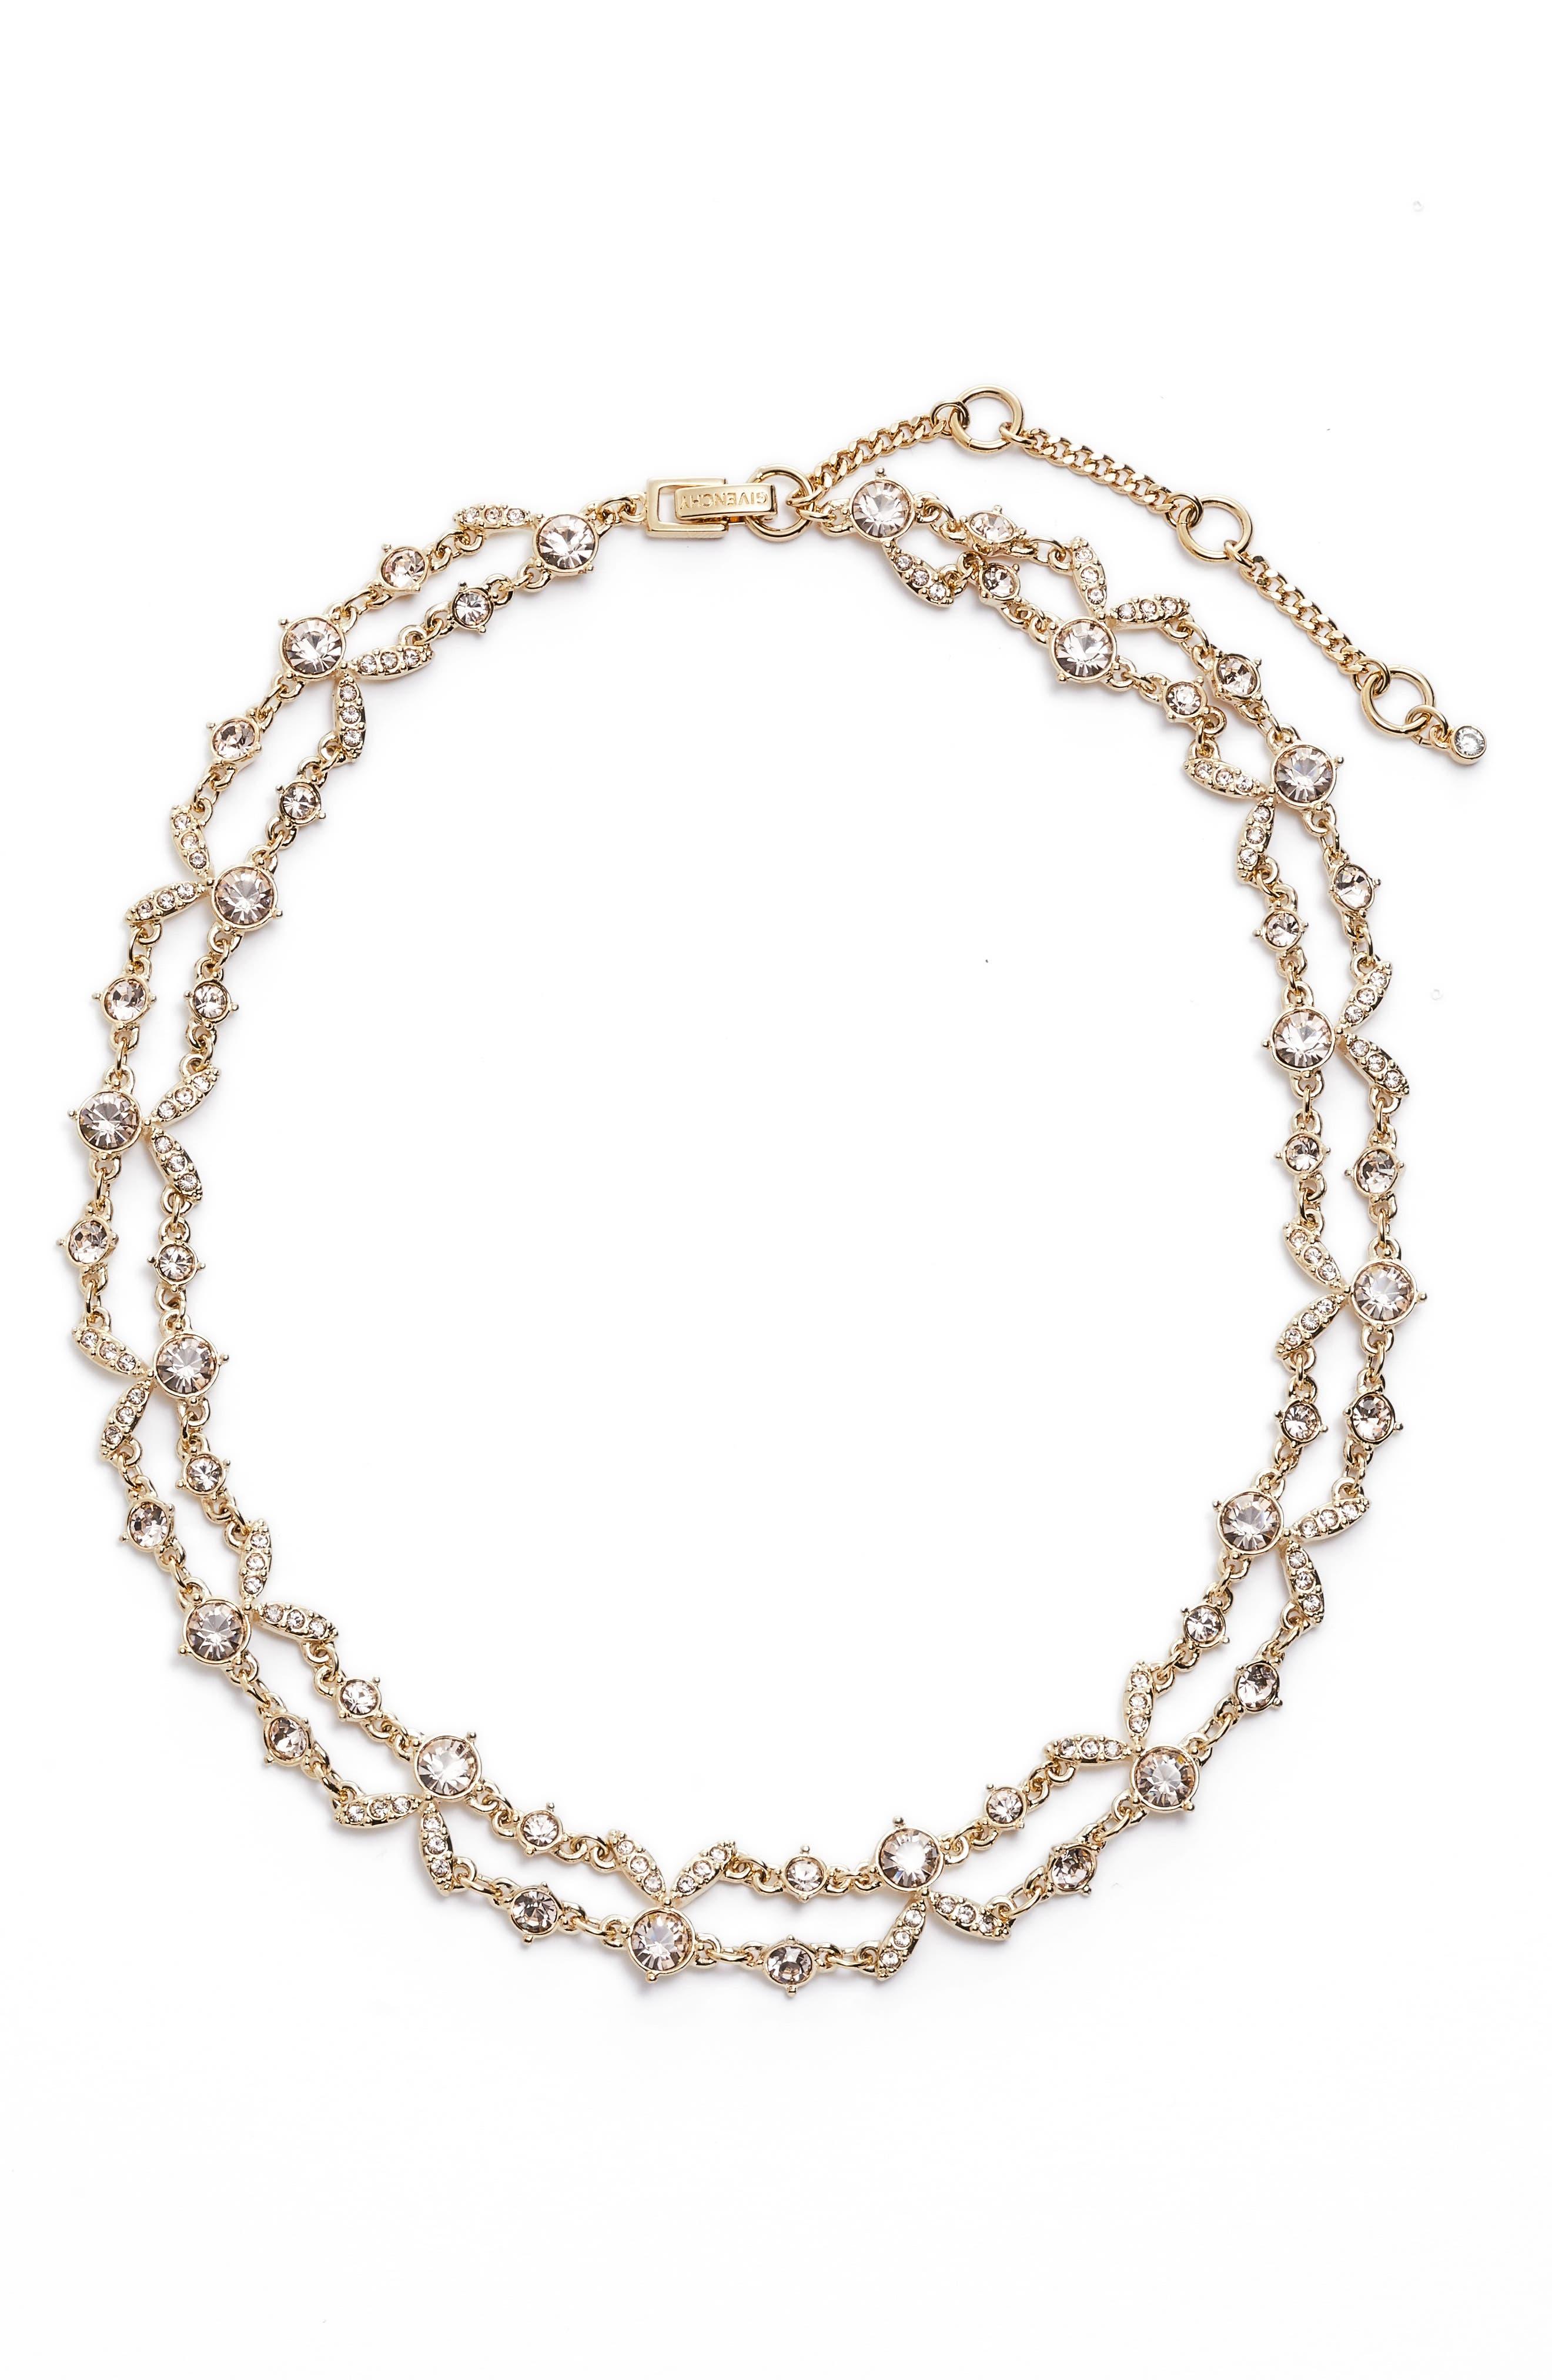 2-Row Crystal Collar Necklace,                             Main thumbnail 1, color,                             Gold/ Silk